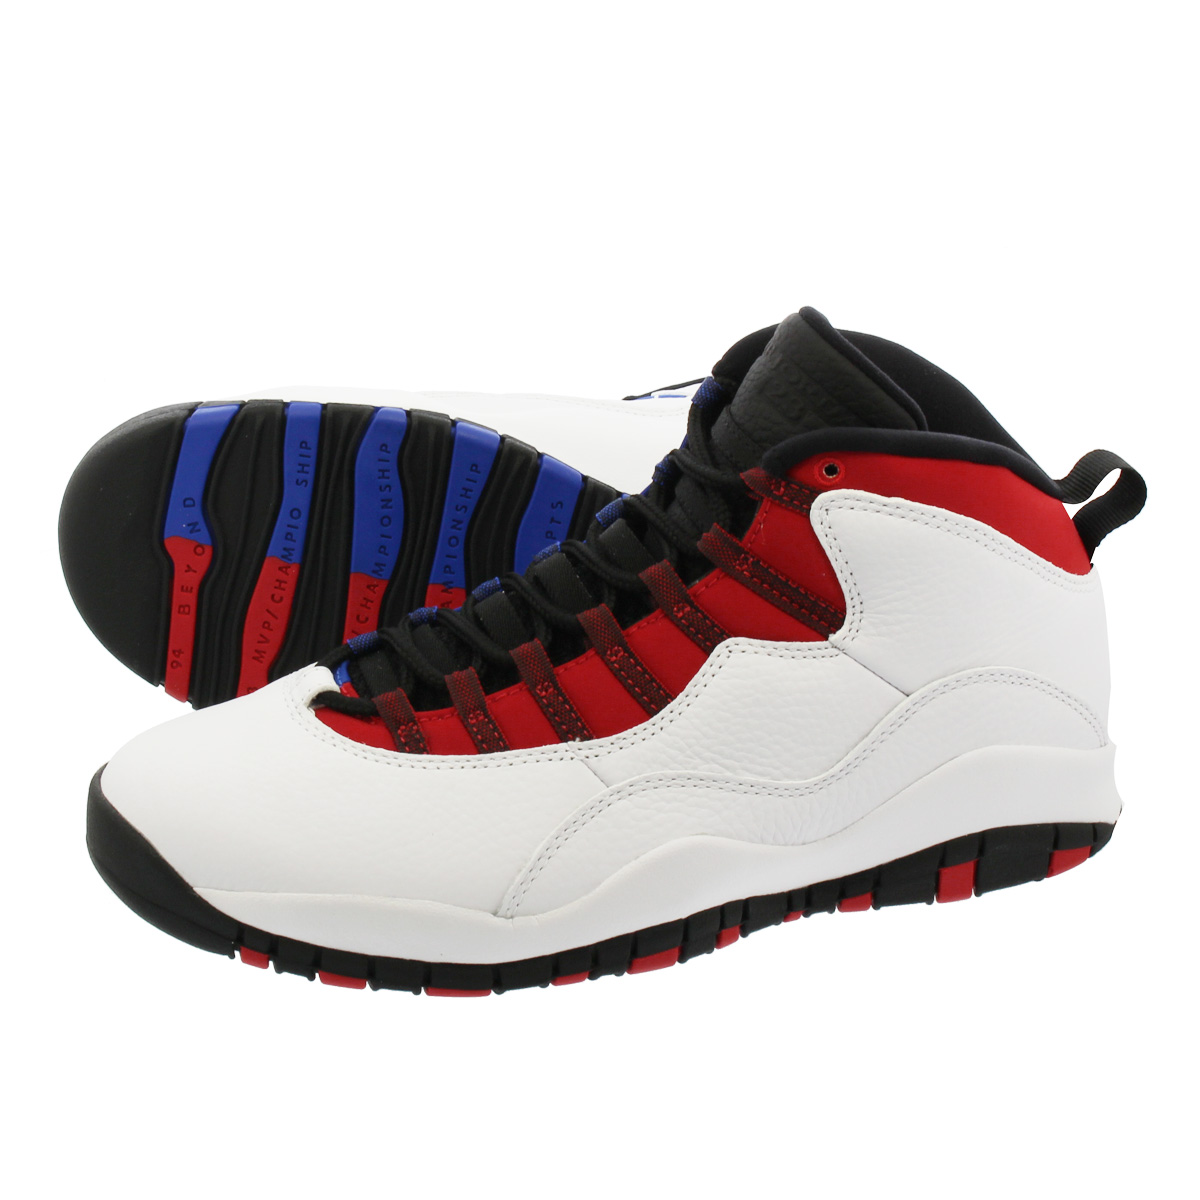 purchase cheap 79775 18c04 NIKE AIR JORDAN 10 RETRO Nike Air Jordan 10 nostalgic  WHITE/BLACK/UNIVERSITY RED/HYPER ROYAL 310,805-160